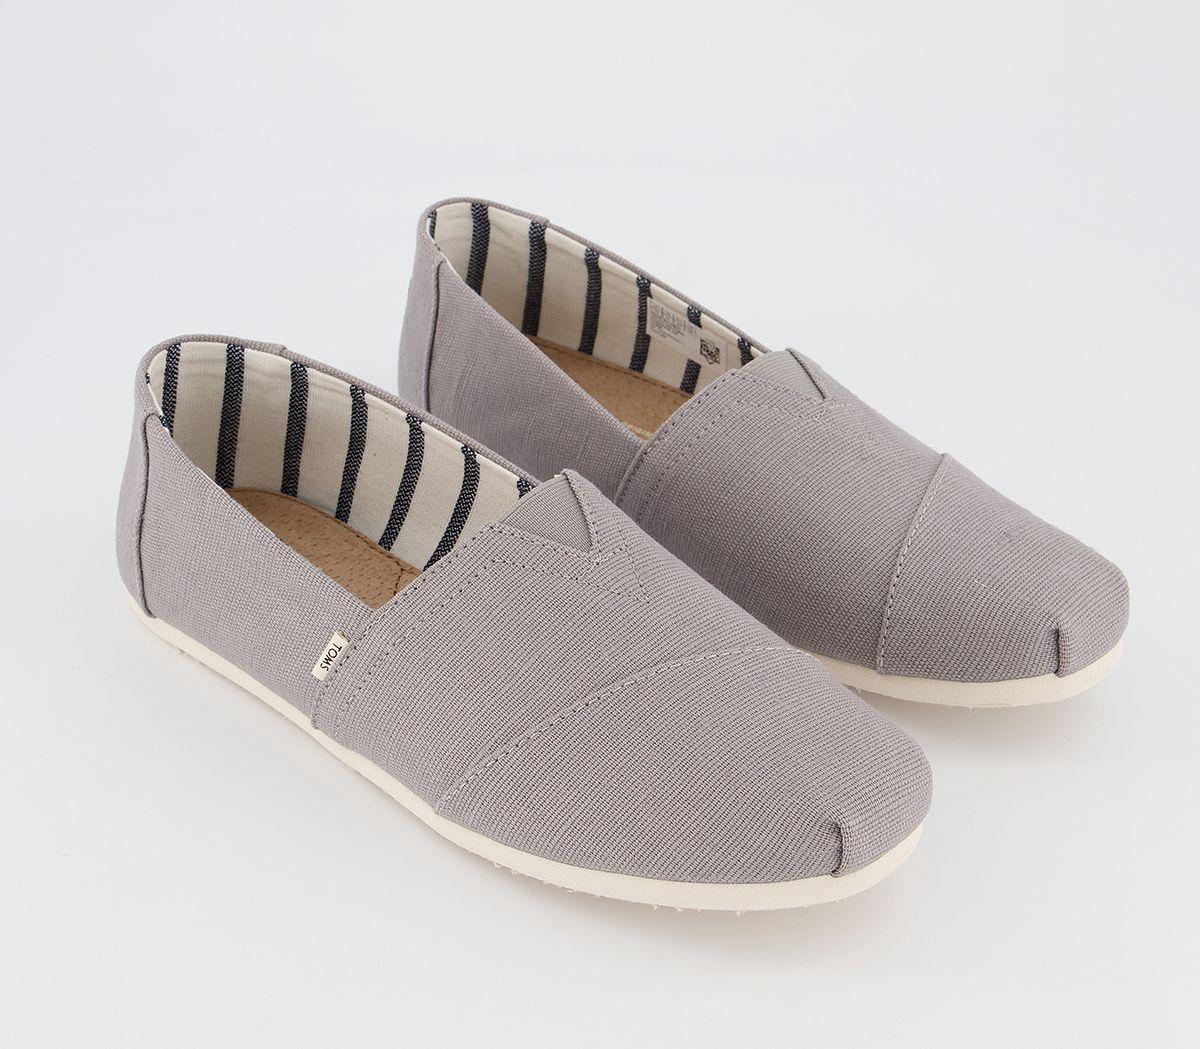 Da-Uomo-Toms-Toms-Classic-SLIP-ONS-TORTORA-Heritage-Scarpe-Casual miniatura 7